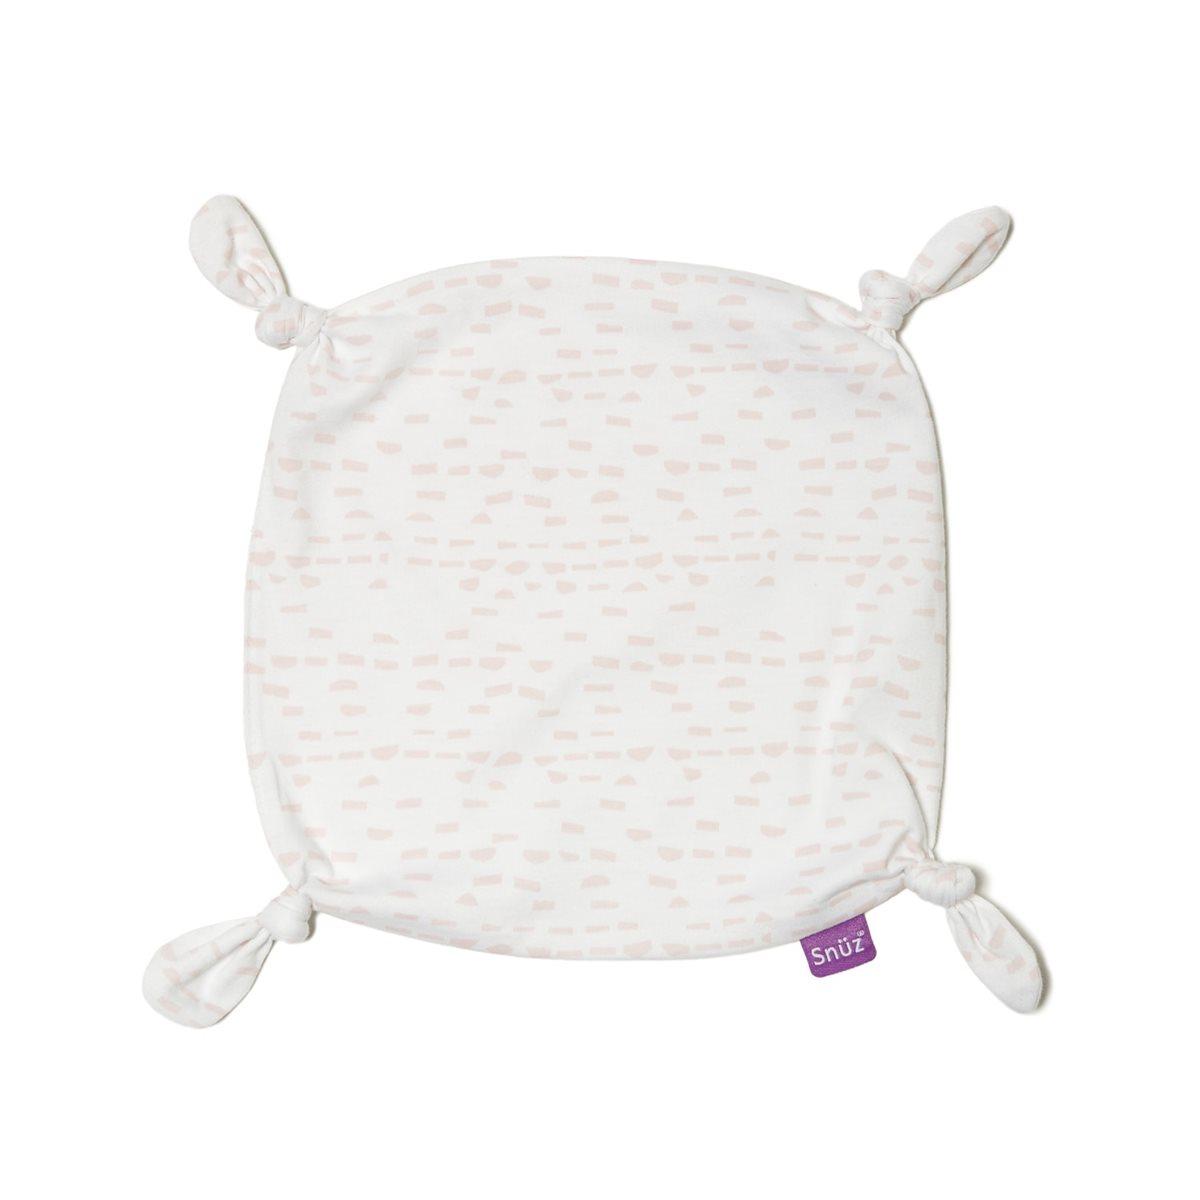 Sleepsuit Amp Baby Comforter Gift Set Wave Rose Sn 252 Z